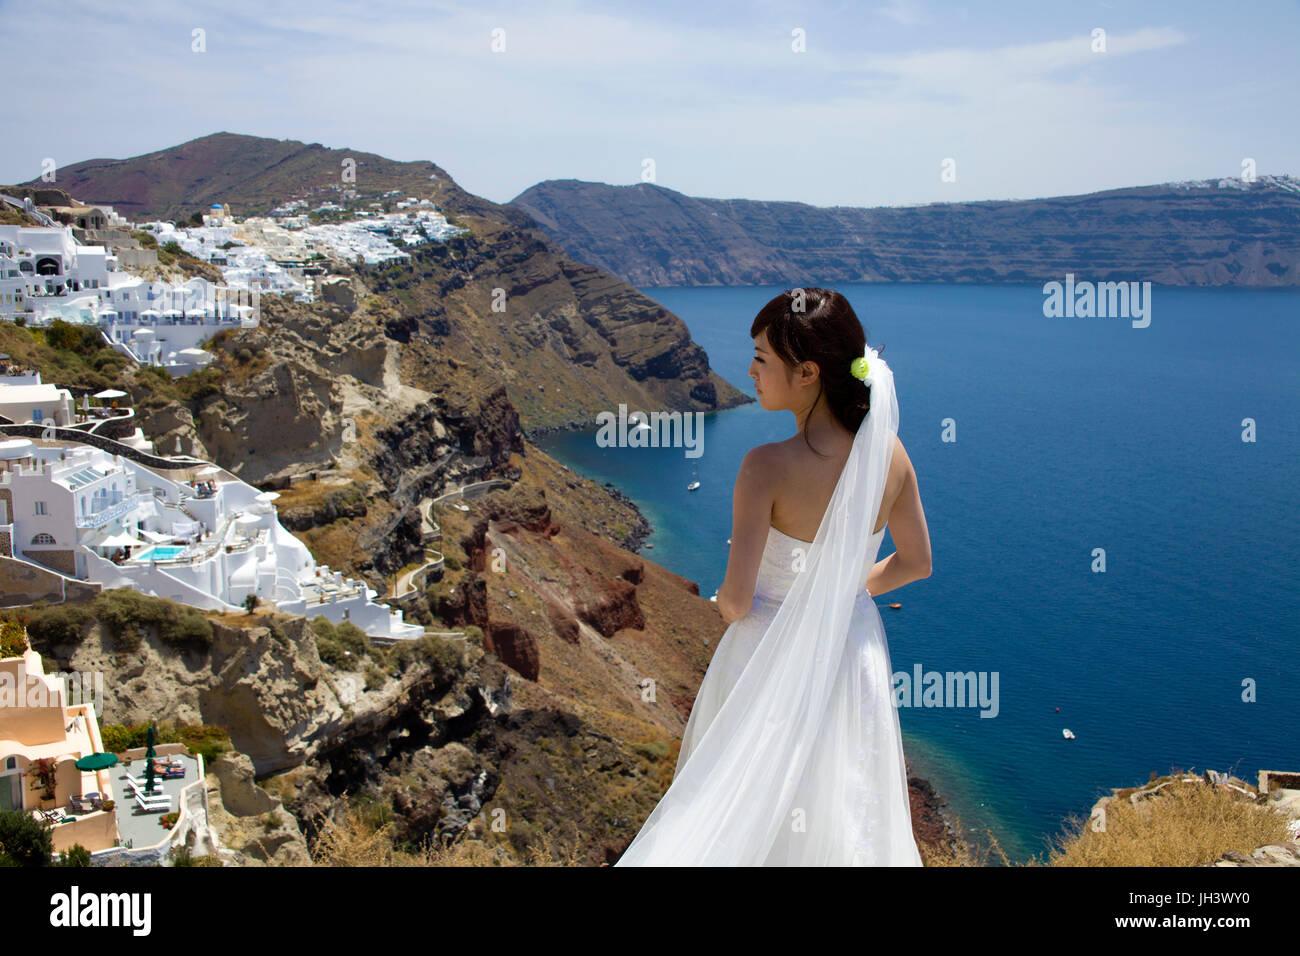 Braut am Kraterrand bei Oia, Santorin, Kykladen, Aegaeis, Griechenland, Mittelmeer, Europa   Bridal at the crater - Stock Image